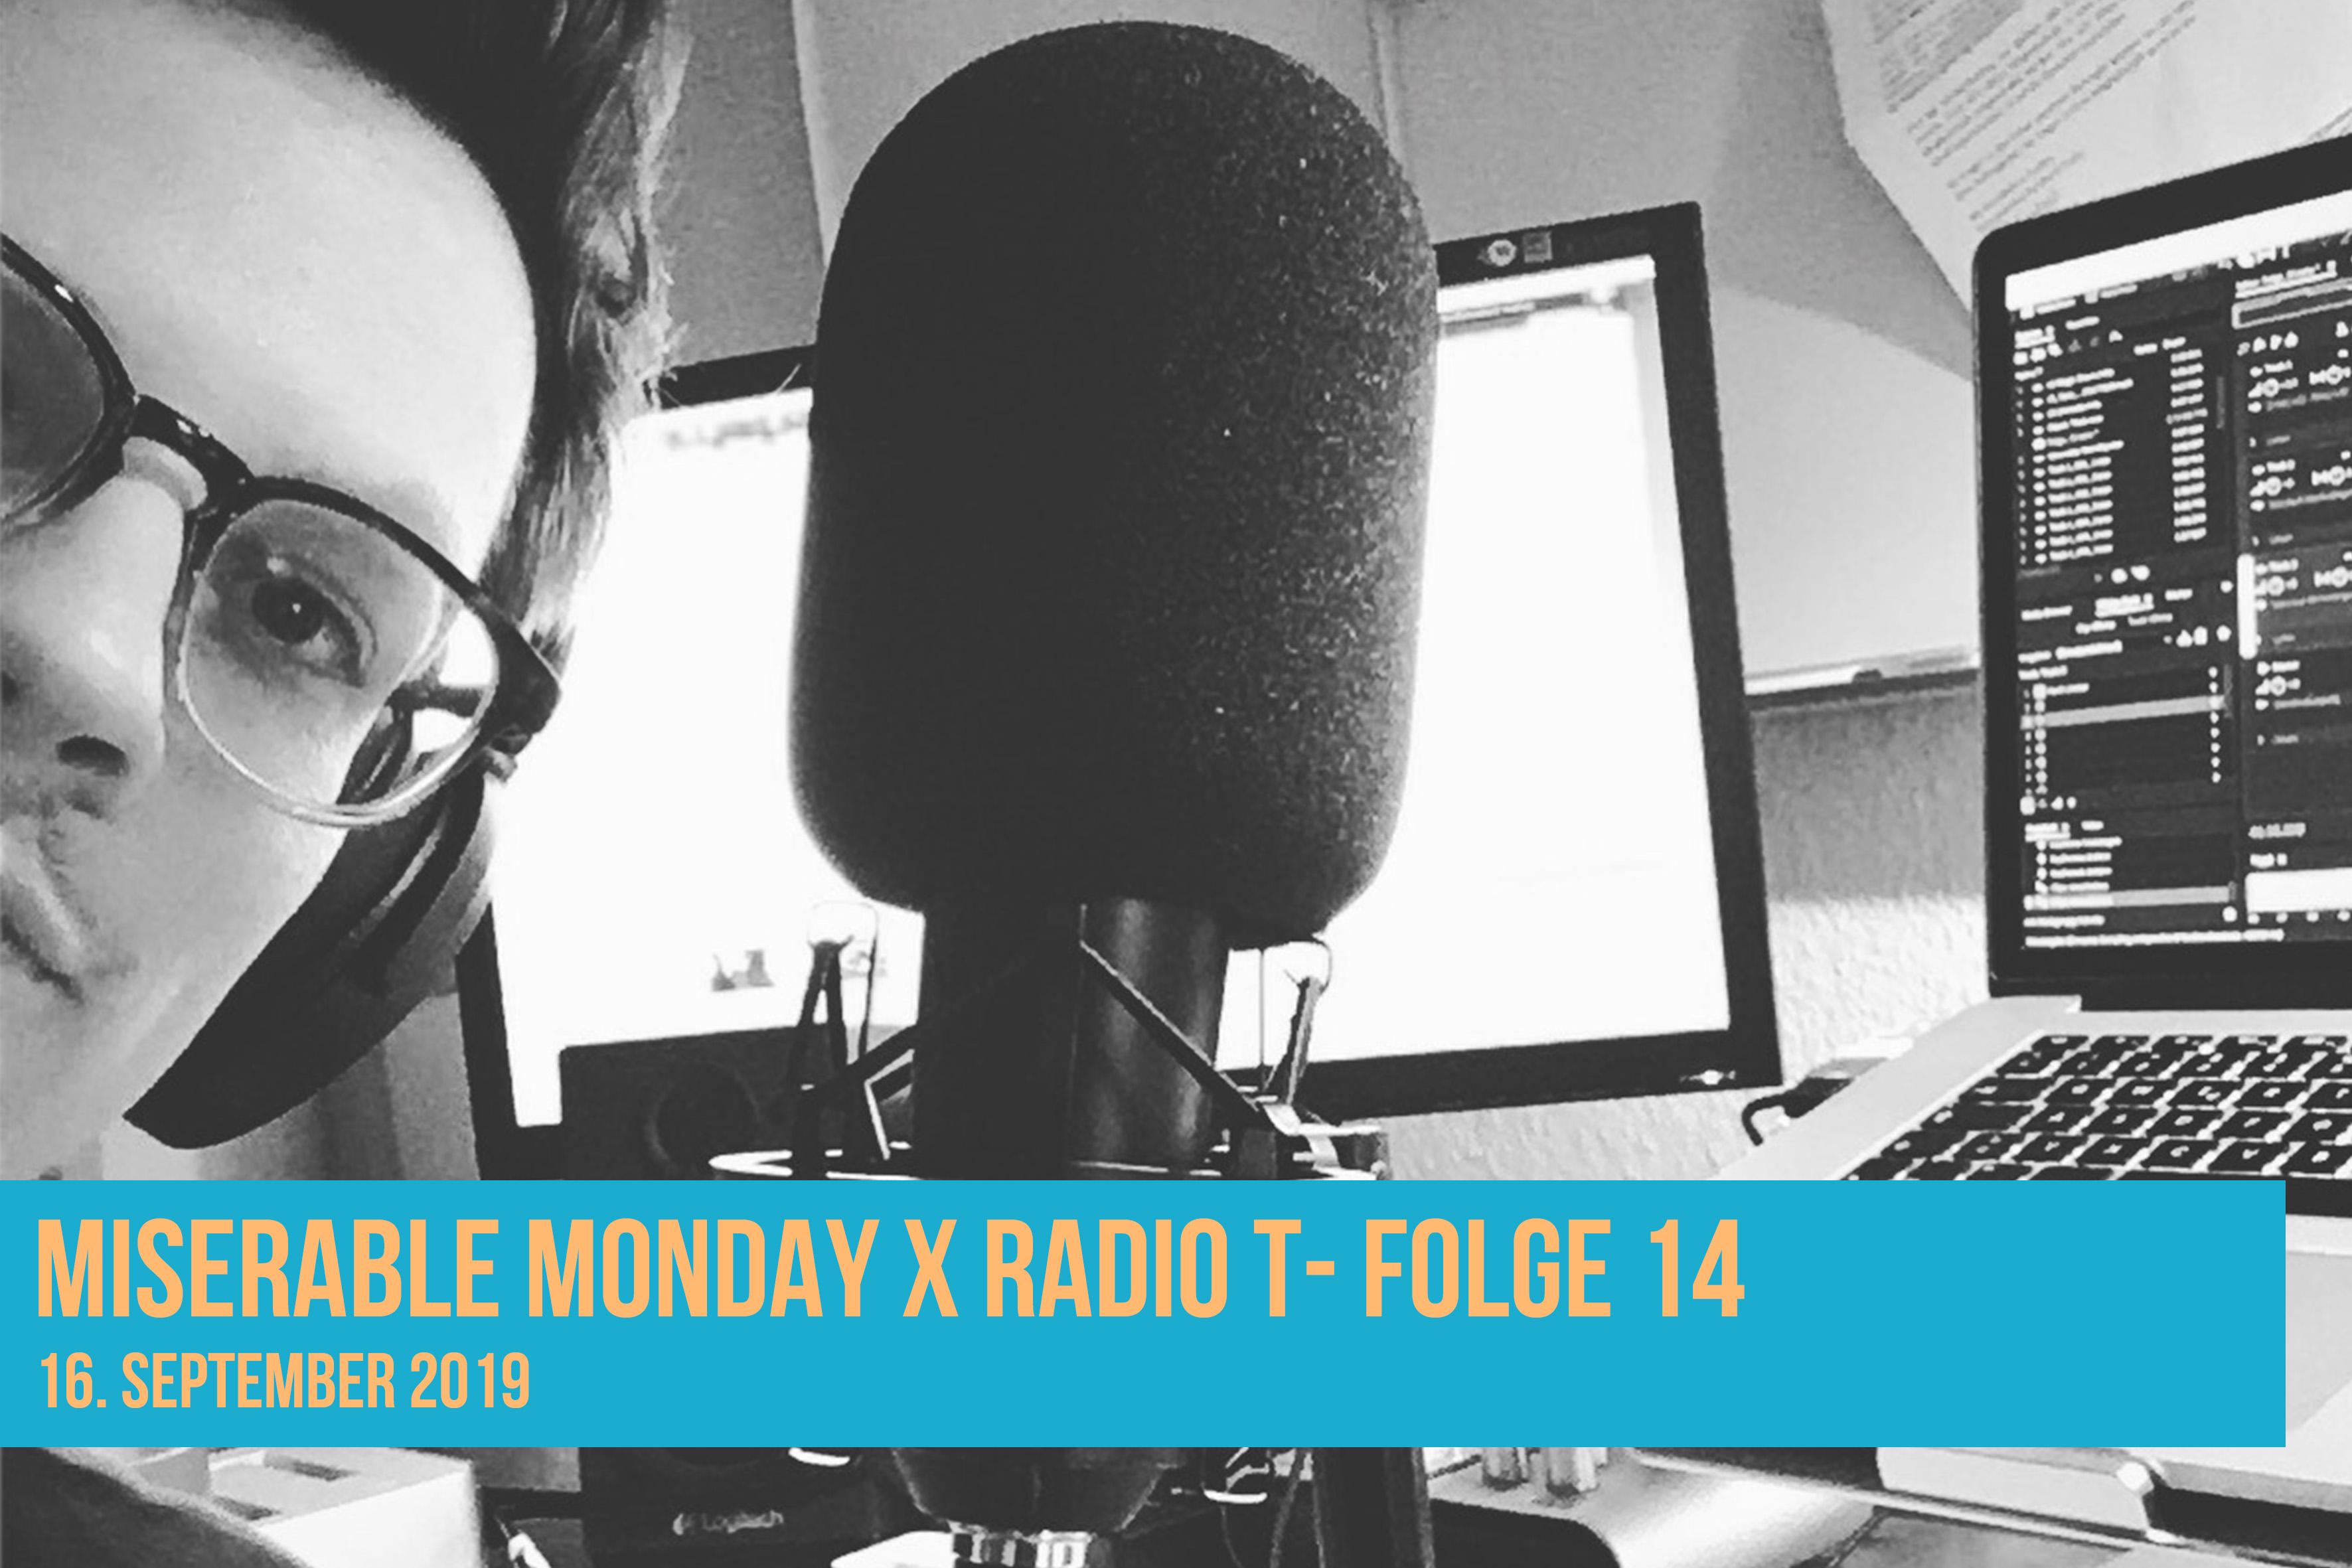 Miserable Monday X RadioT - Folge 14 - (16.09.19)